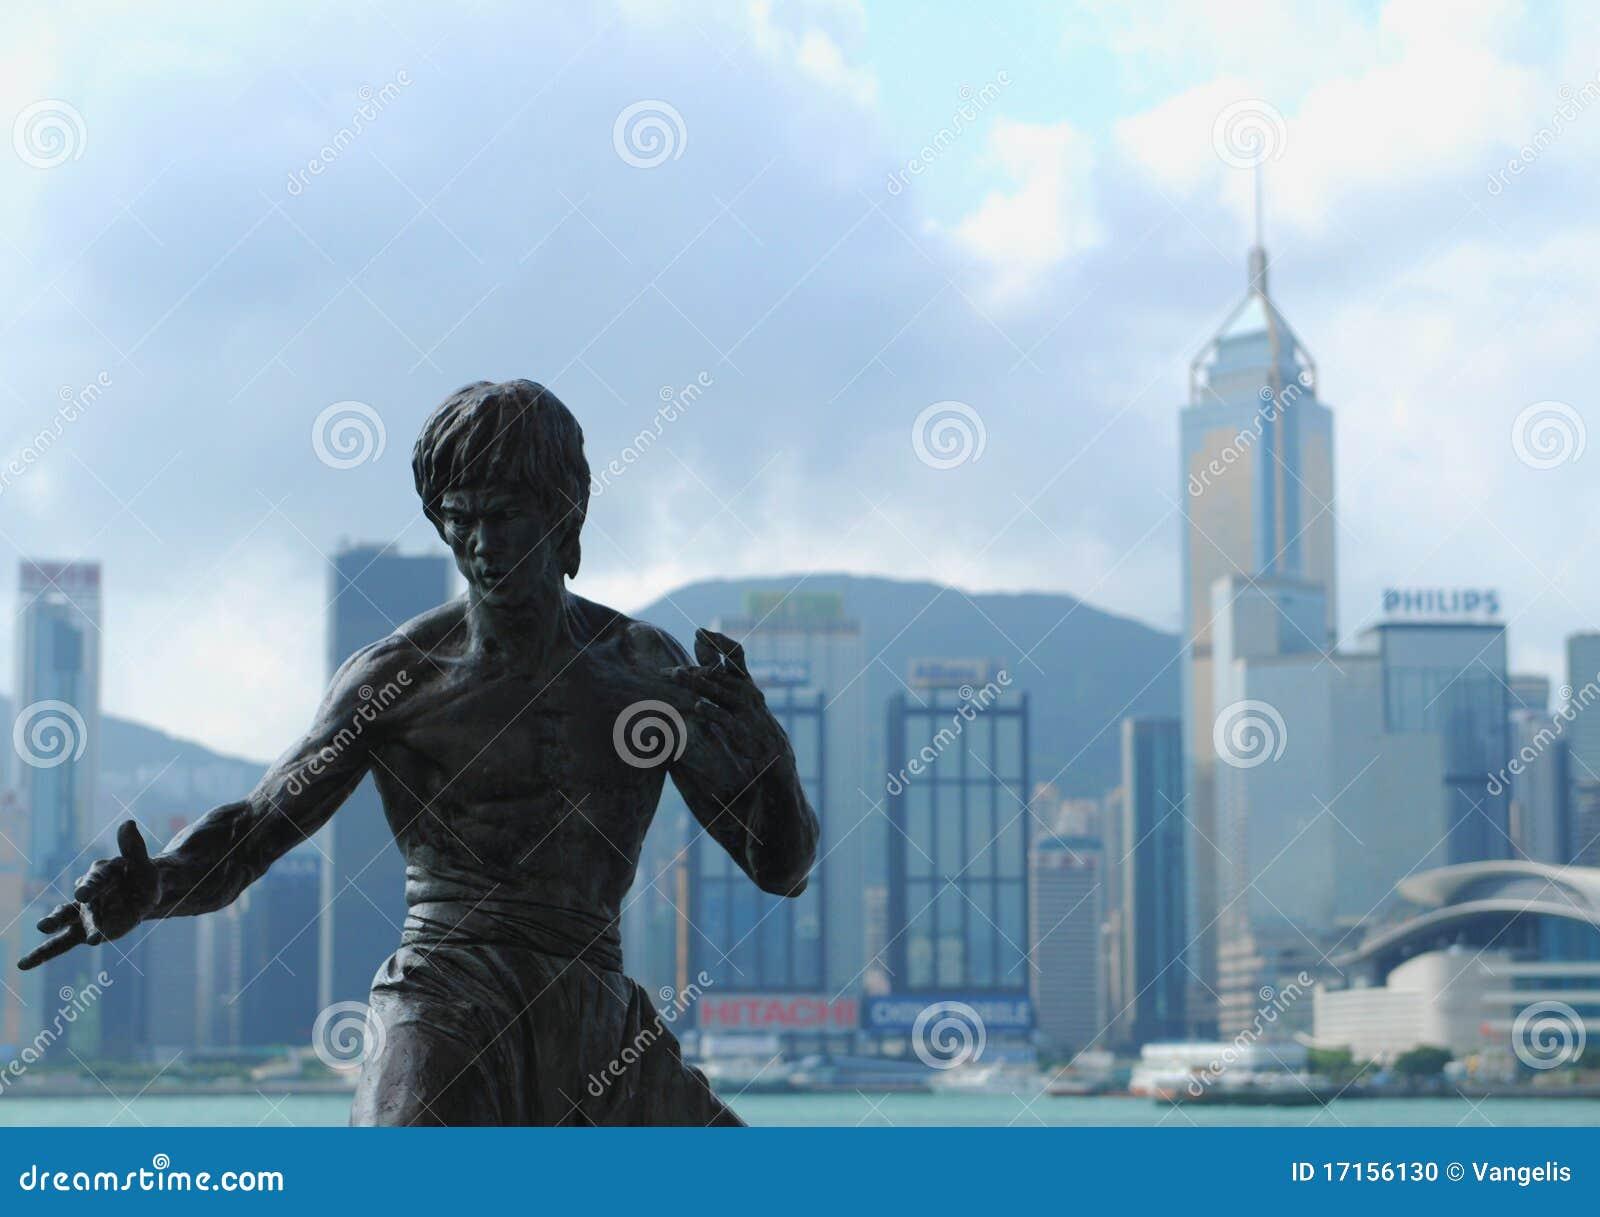 Bruce Lee - Hong Kong